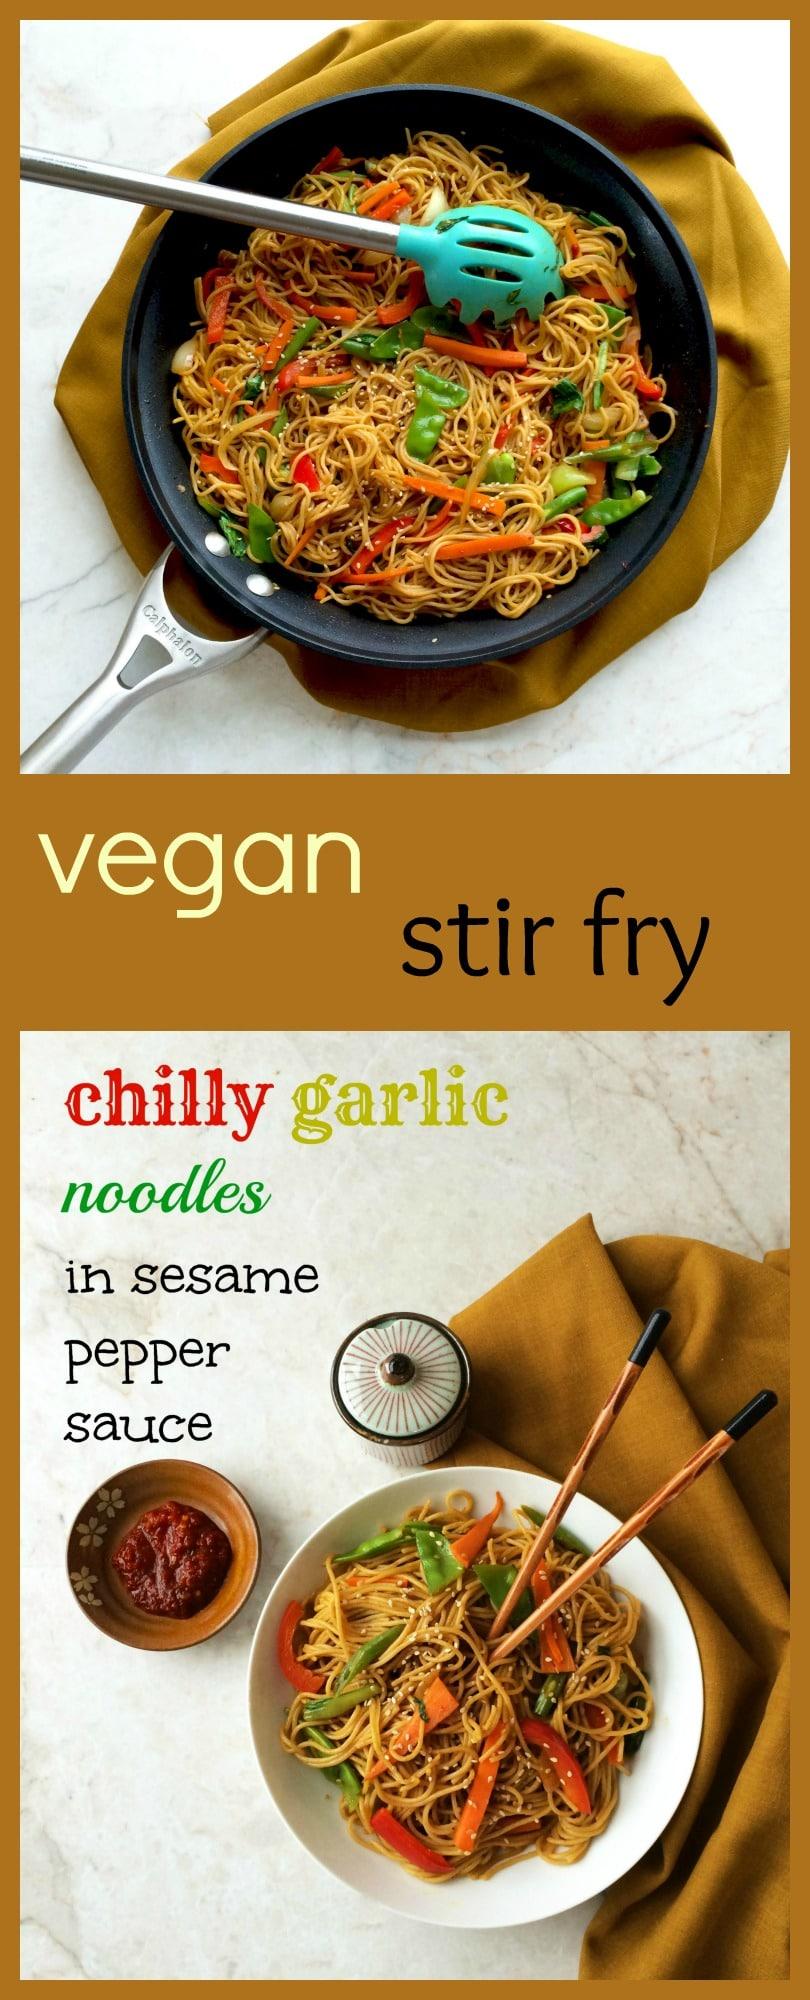 vegan stir fry noodles in sesame pepper sauce